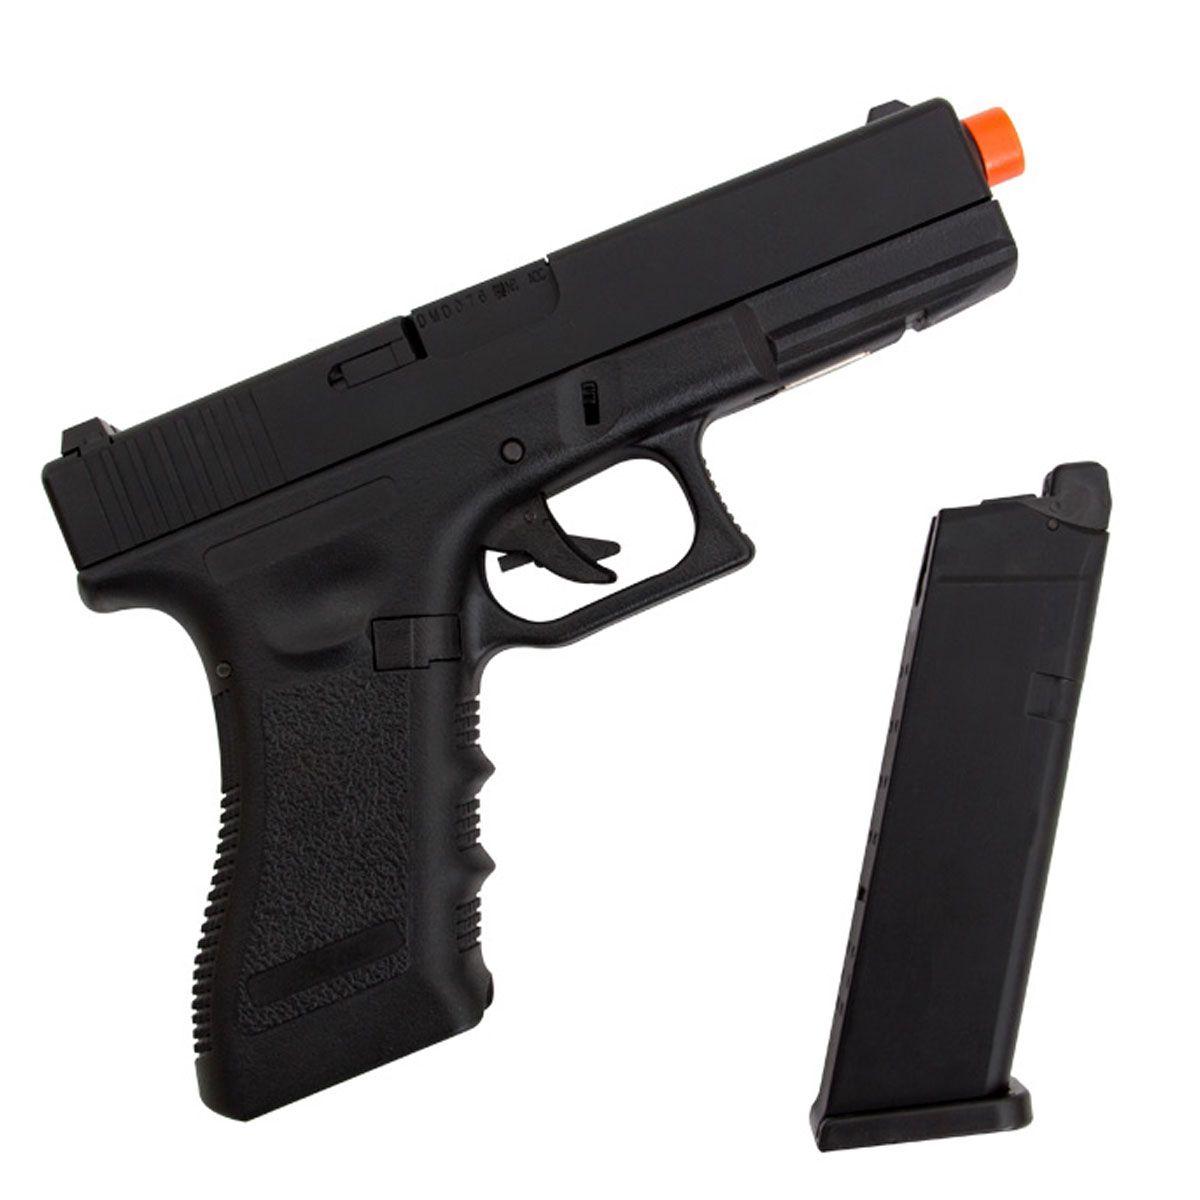 Pistola Airsoft Army Armament Glock R17 Black Blowback GBB 6mm